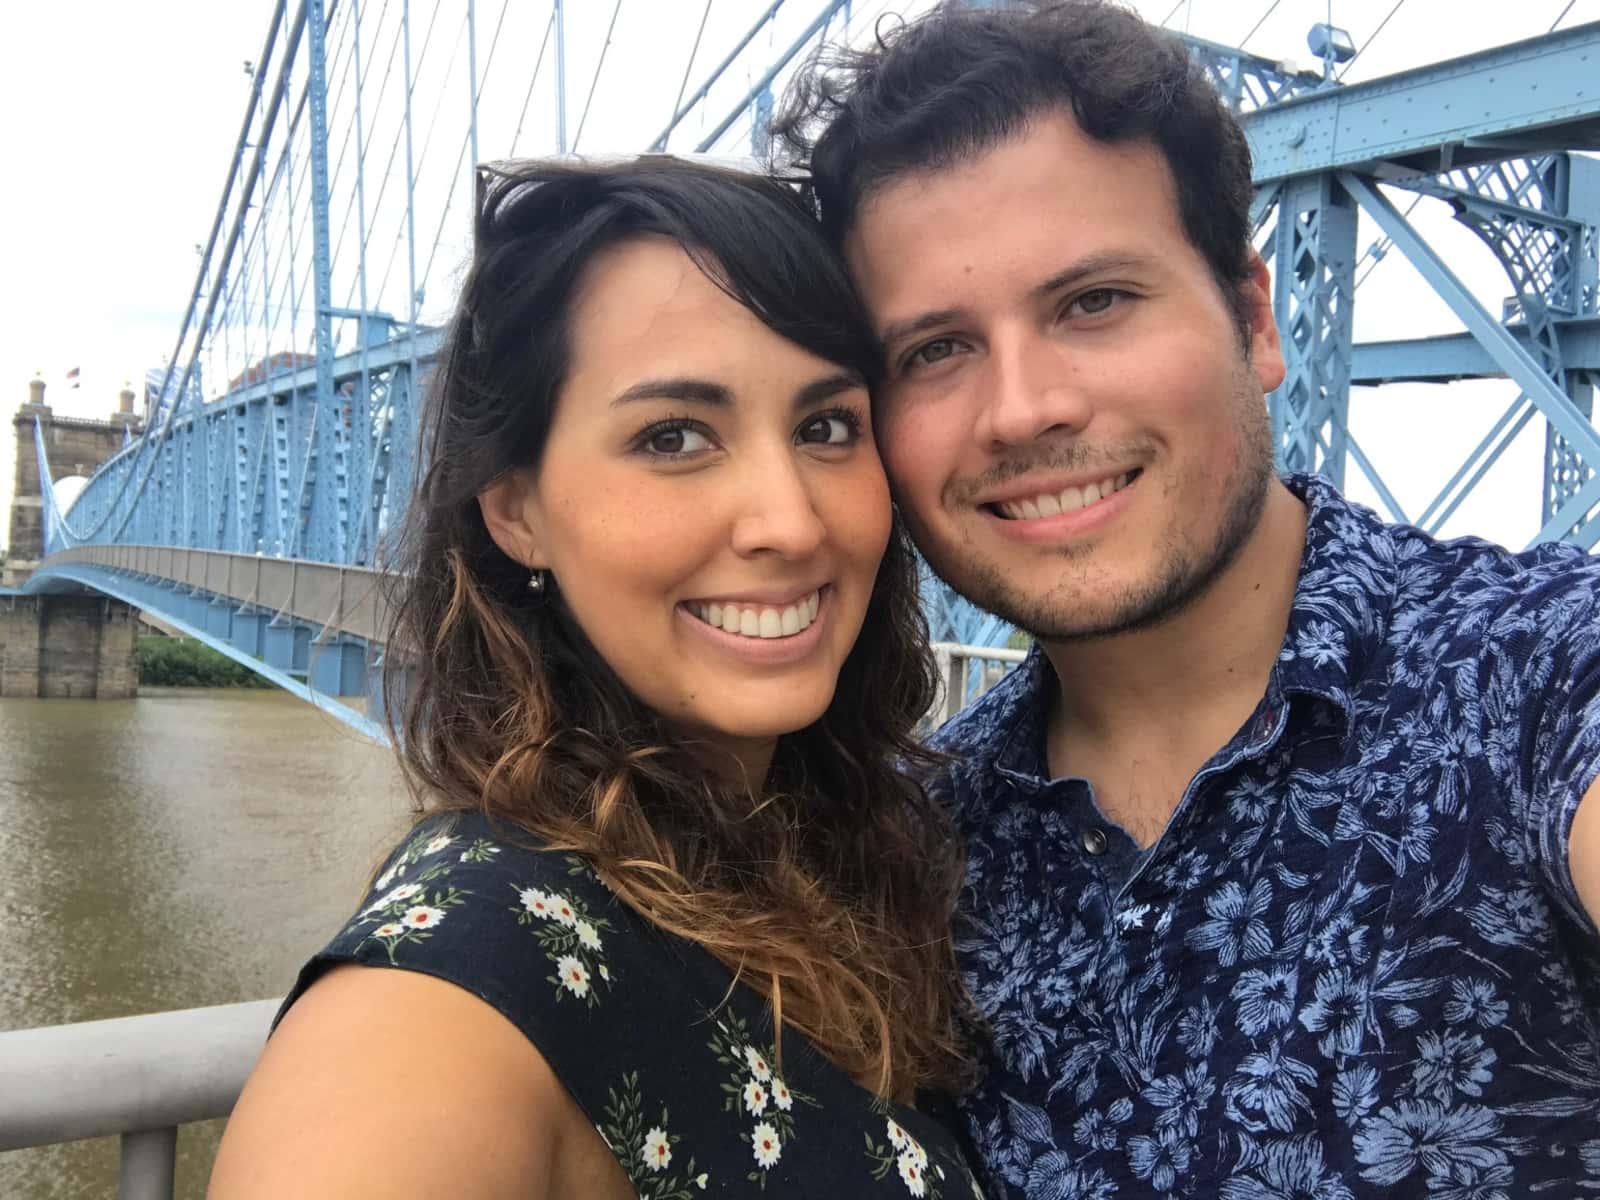 Jose octavio & Dulce maria from Indianapolis, Indiana, United States